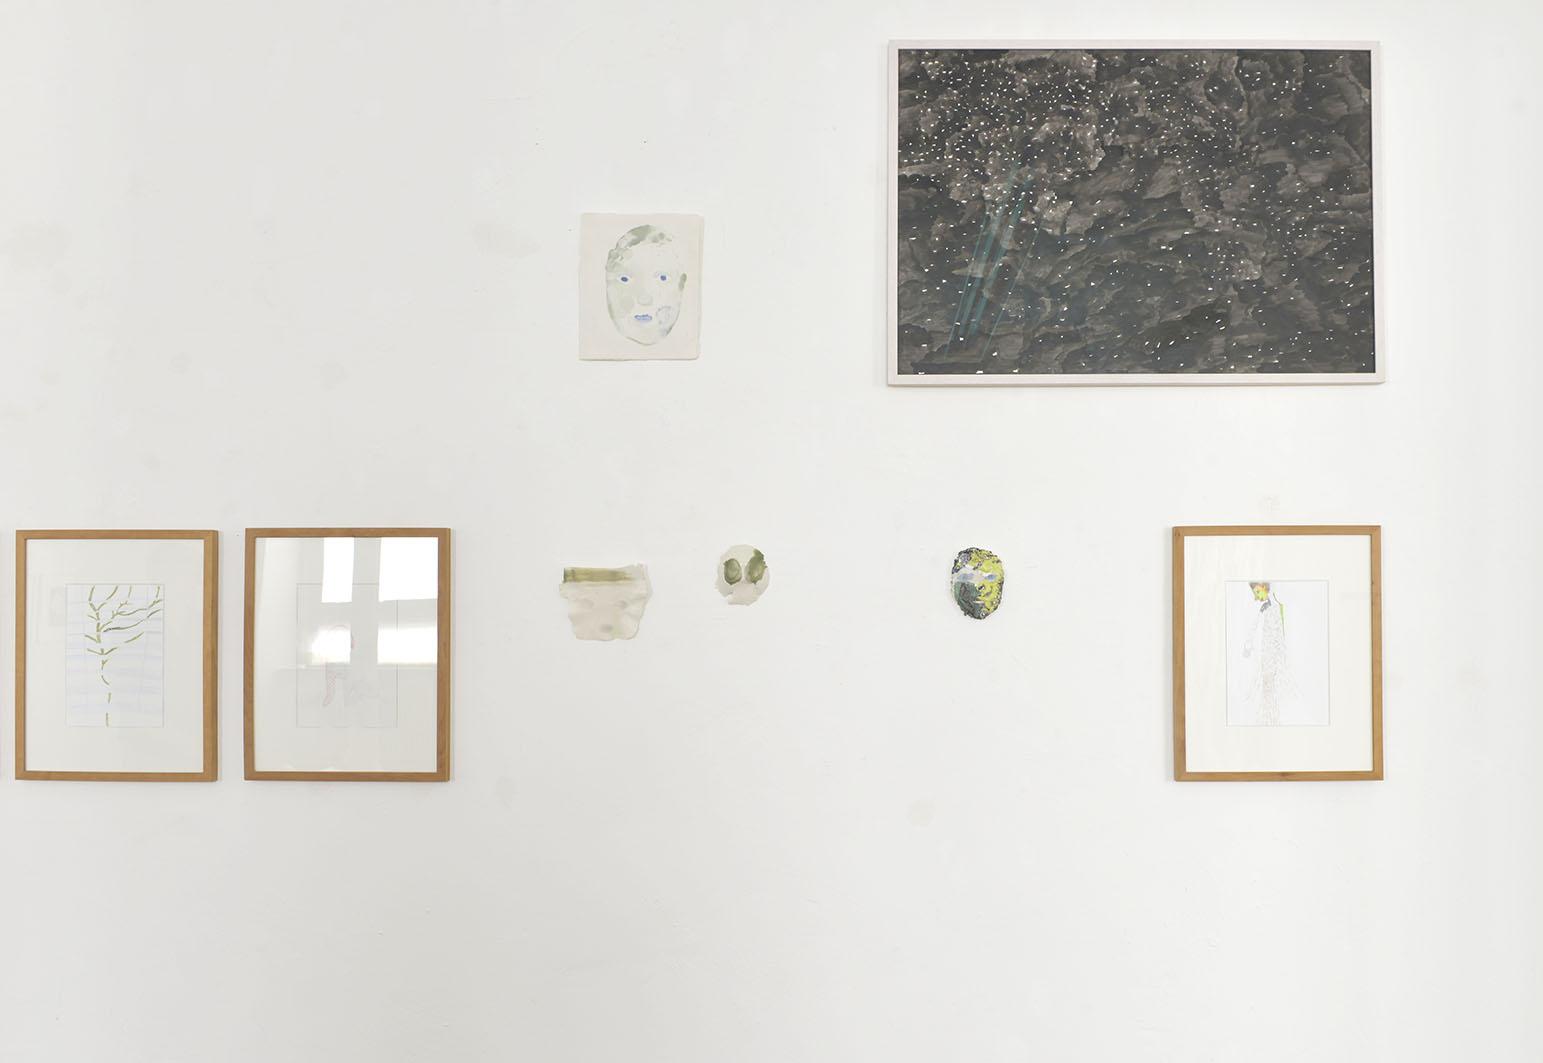 zandra-harms-ausschnitt-kunstlanding-kunstverein-aschaffenburg-1